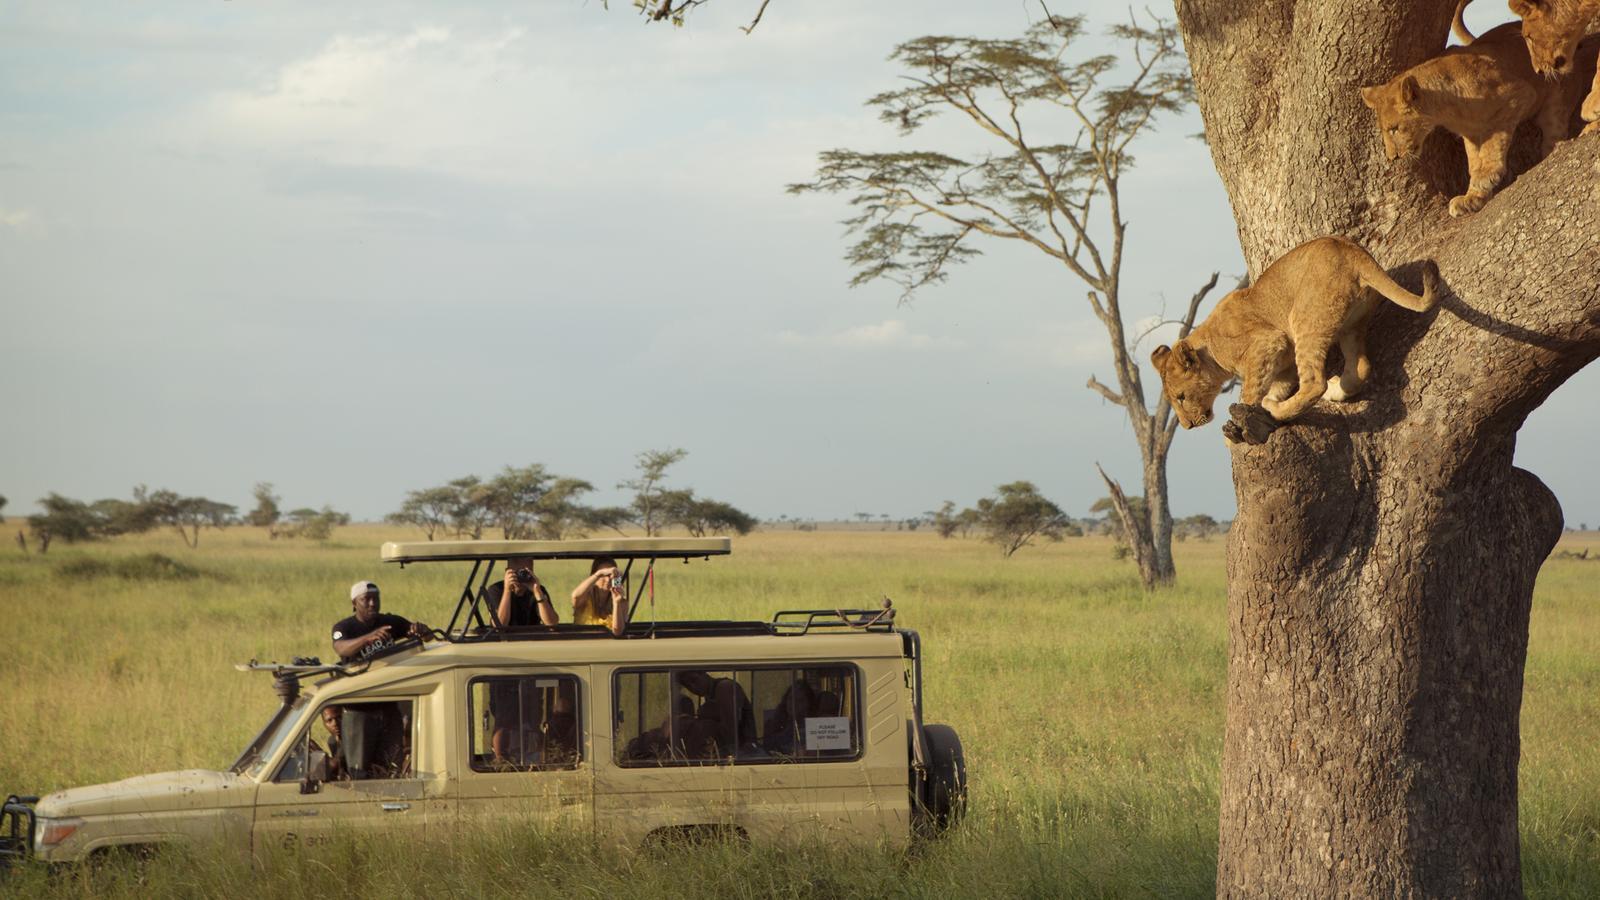 Kenya & Tanzania Safari Experience in Kenya, Africa - G Adventures